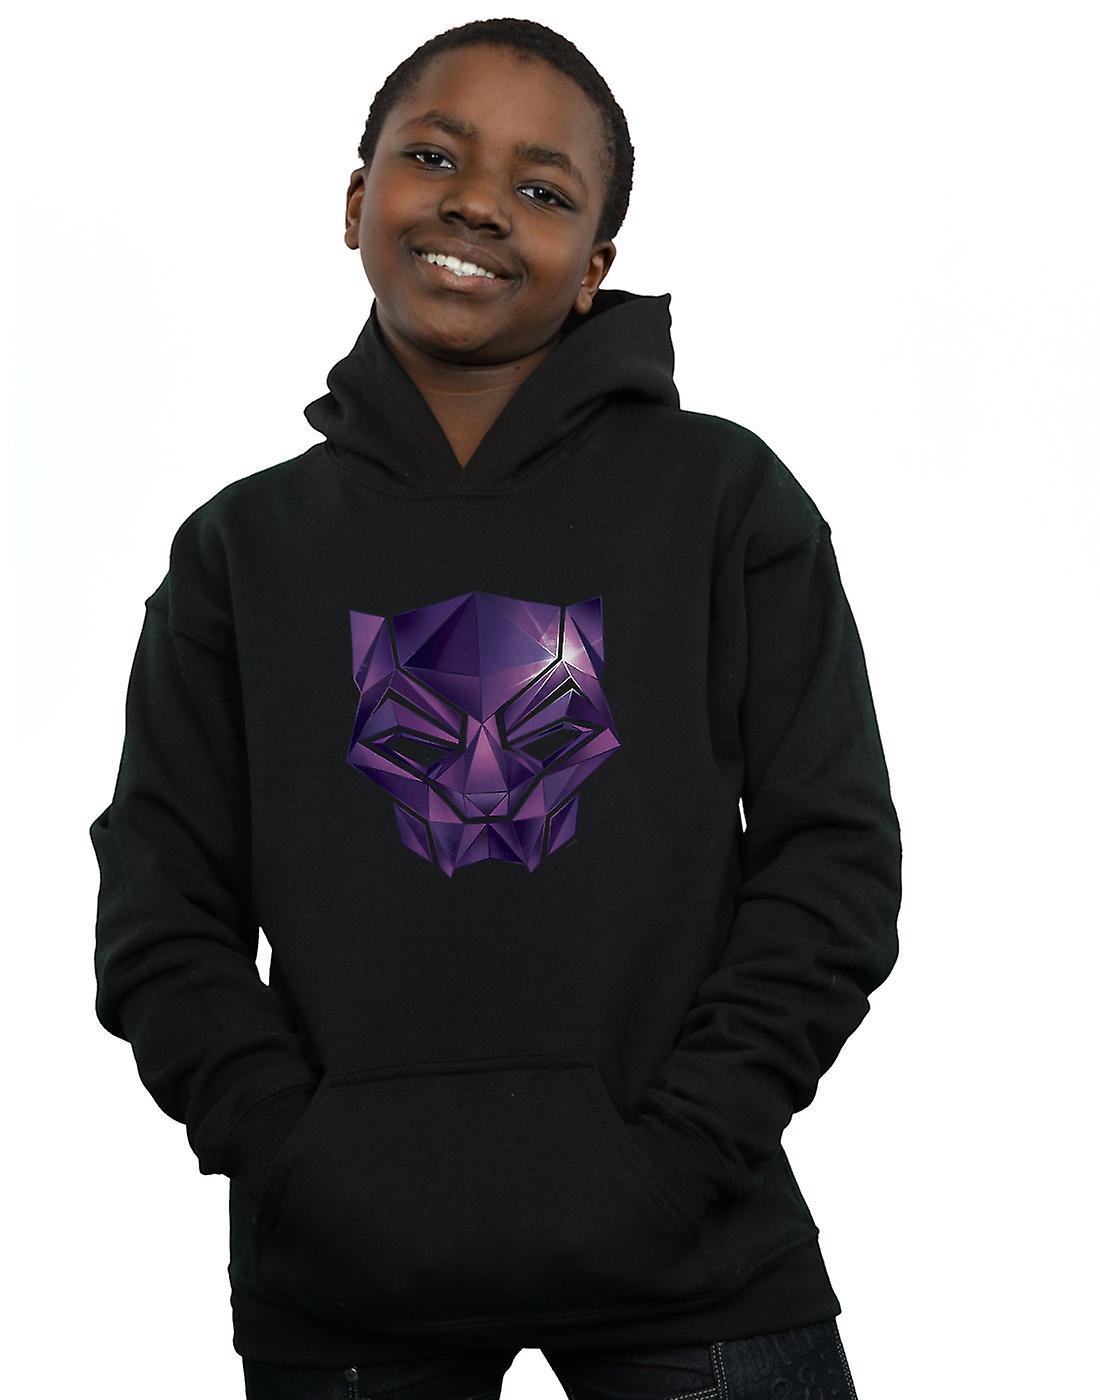 Marvel Boys Avengers Infinity War Black Panther Geometric Hoodie